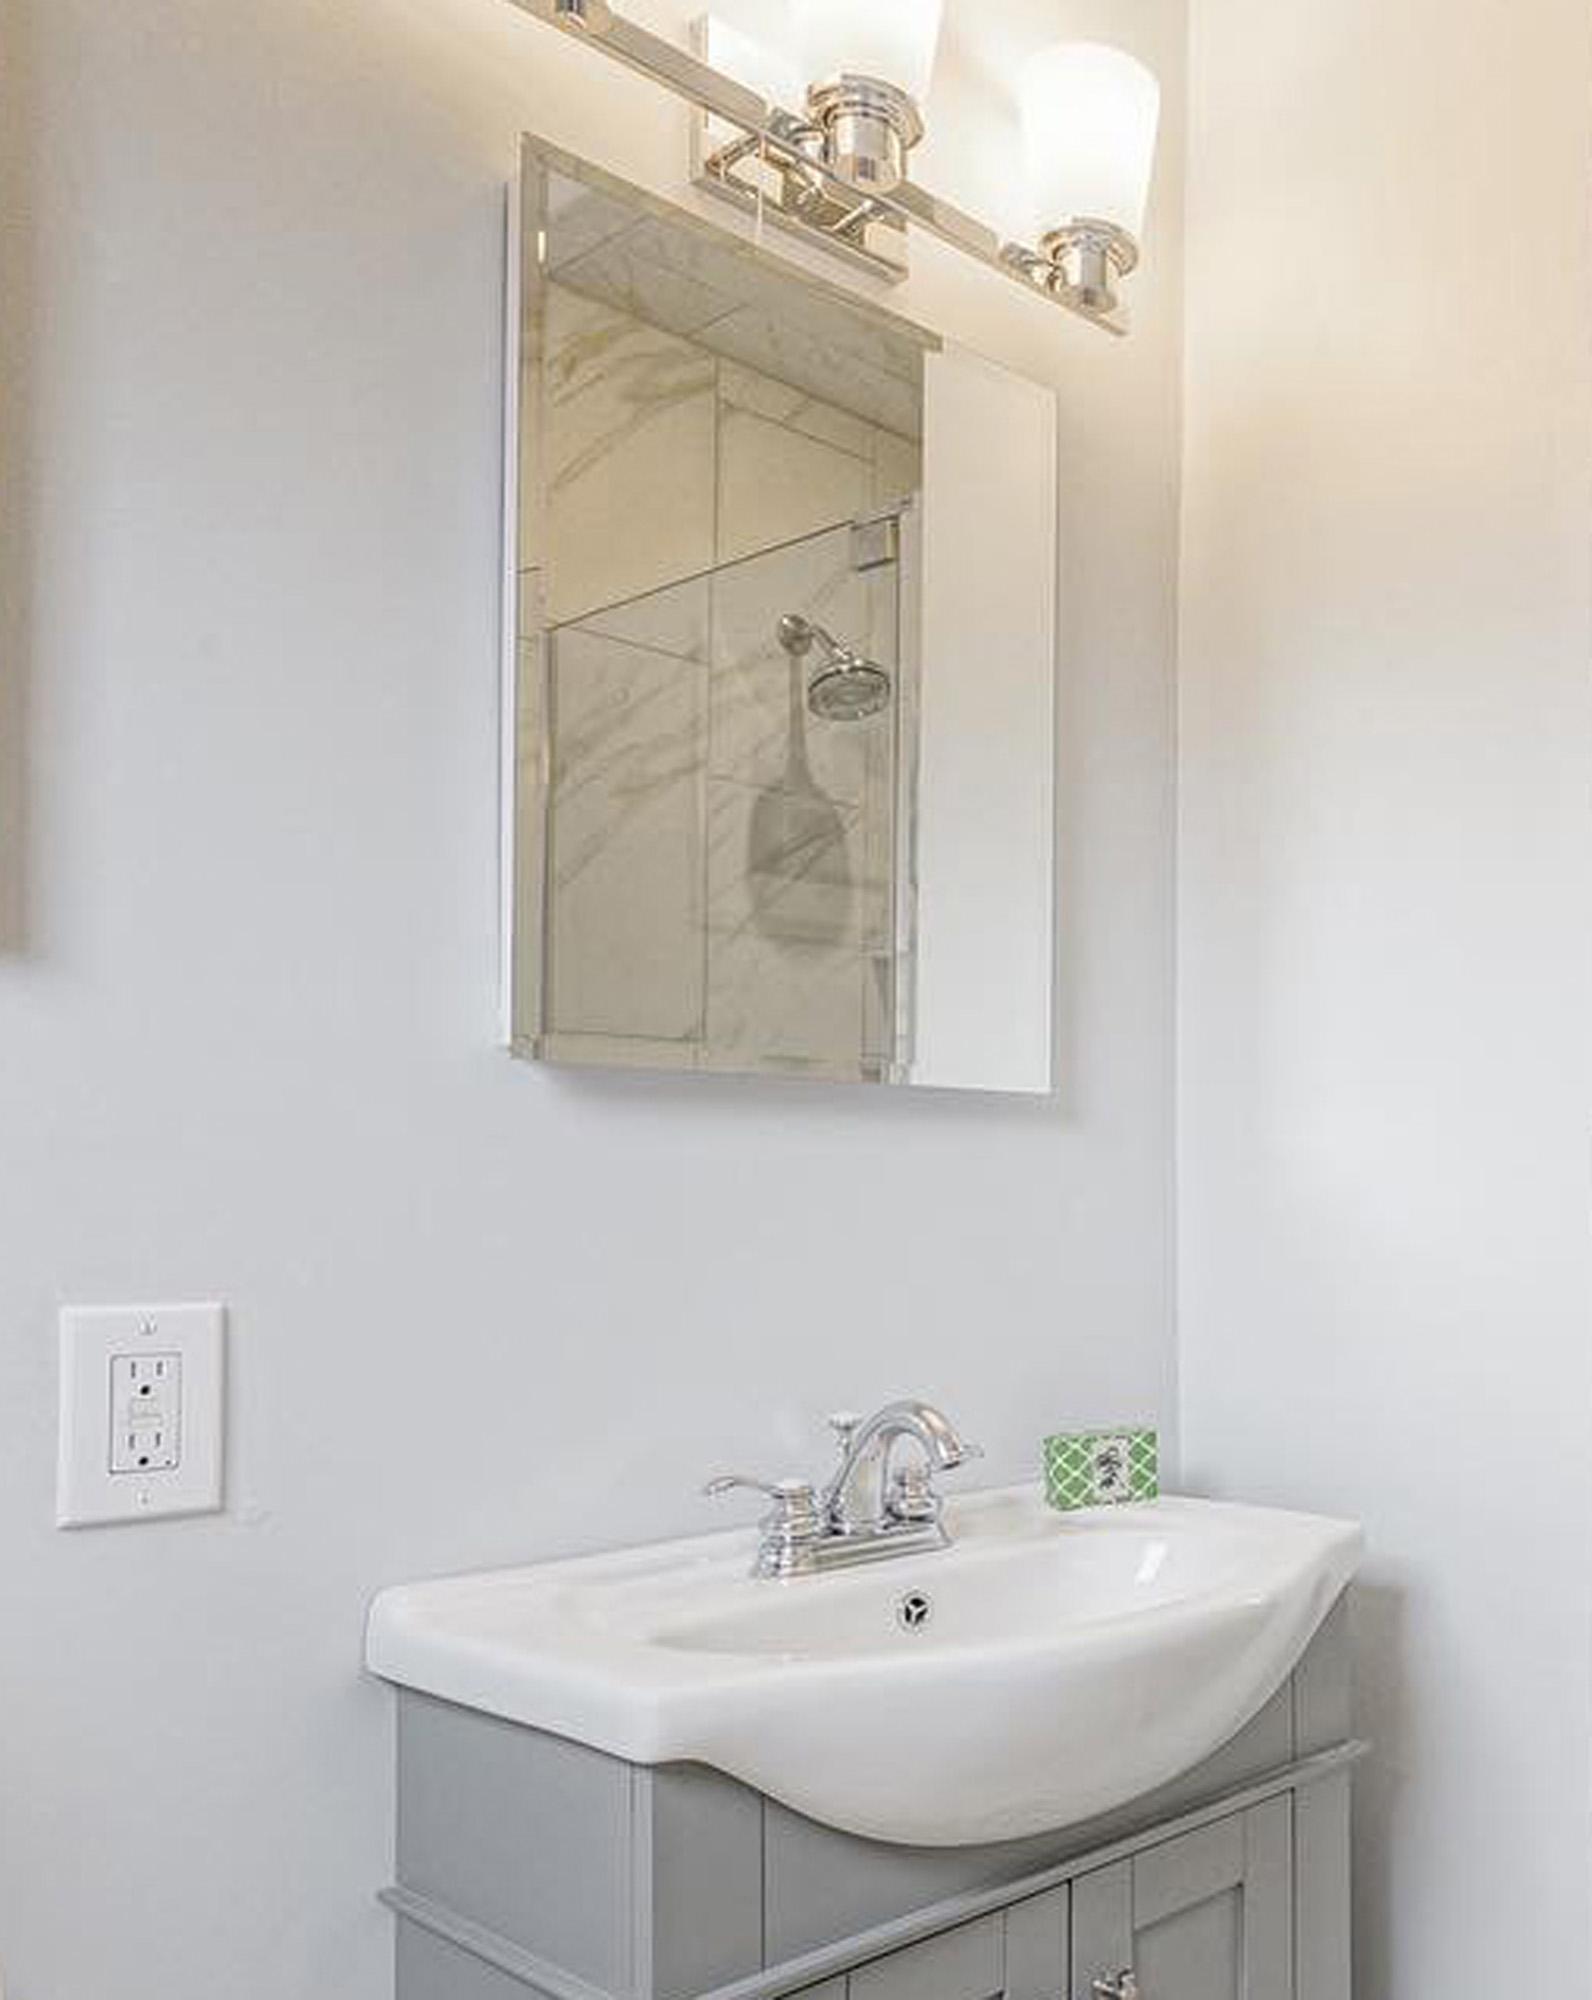 Beveled Edge Mirror 24x30 Decorative Floating Wall Shelf